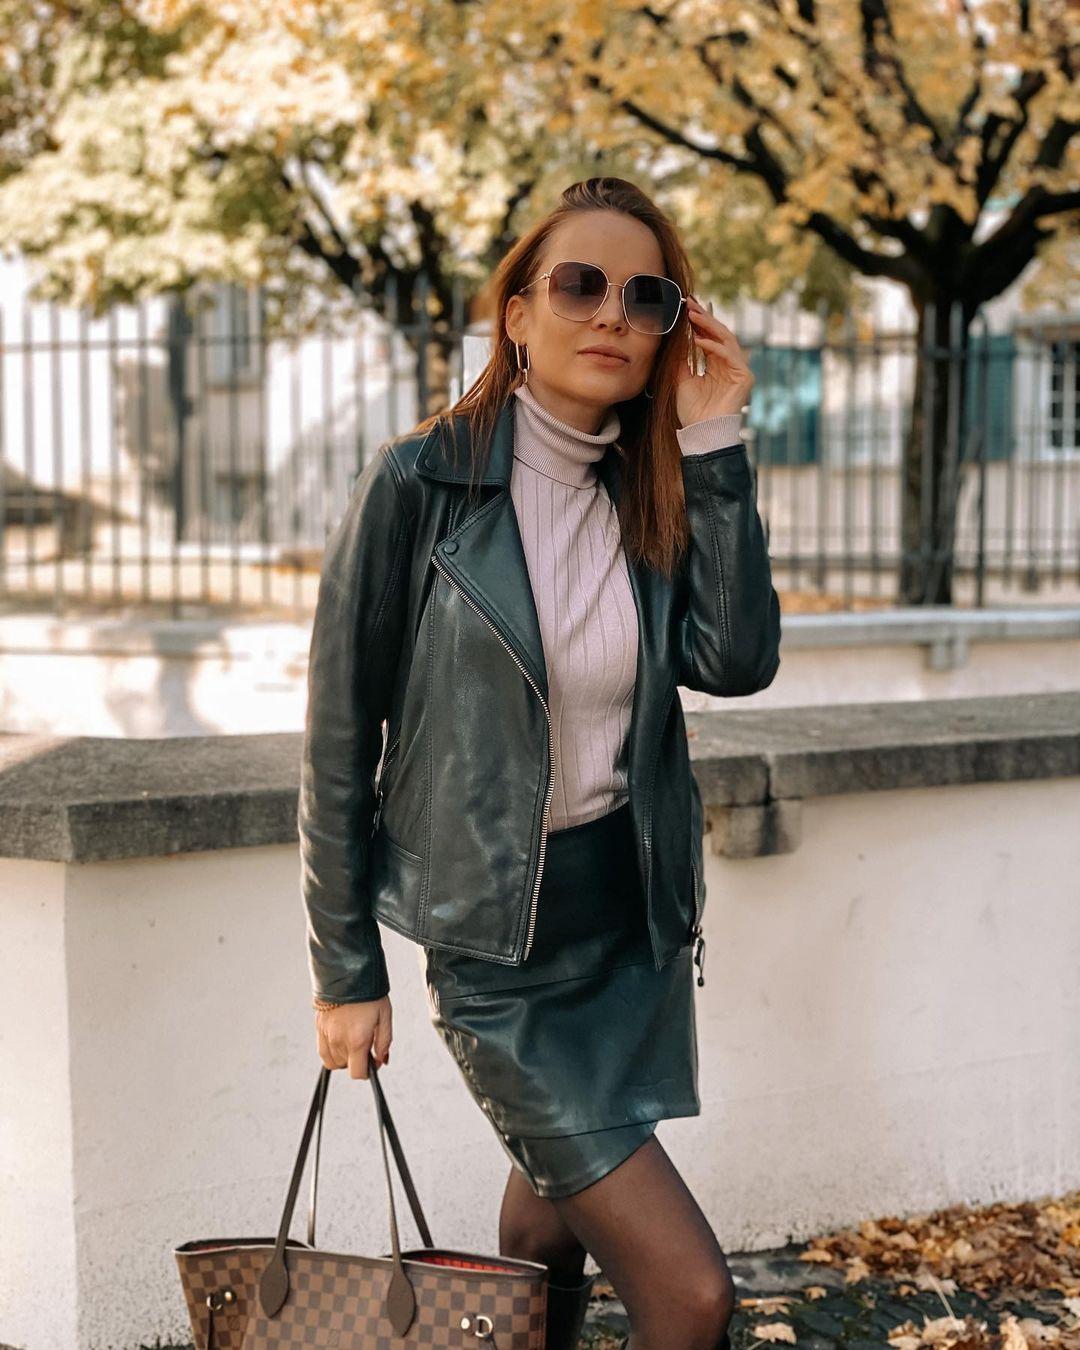 Angelina-Petrova-Wallpapers-Insta-Fit-Bio-1